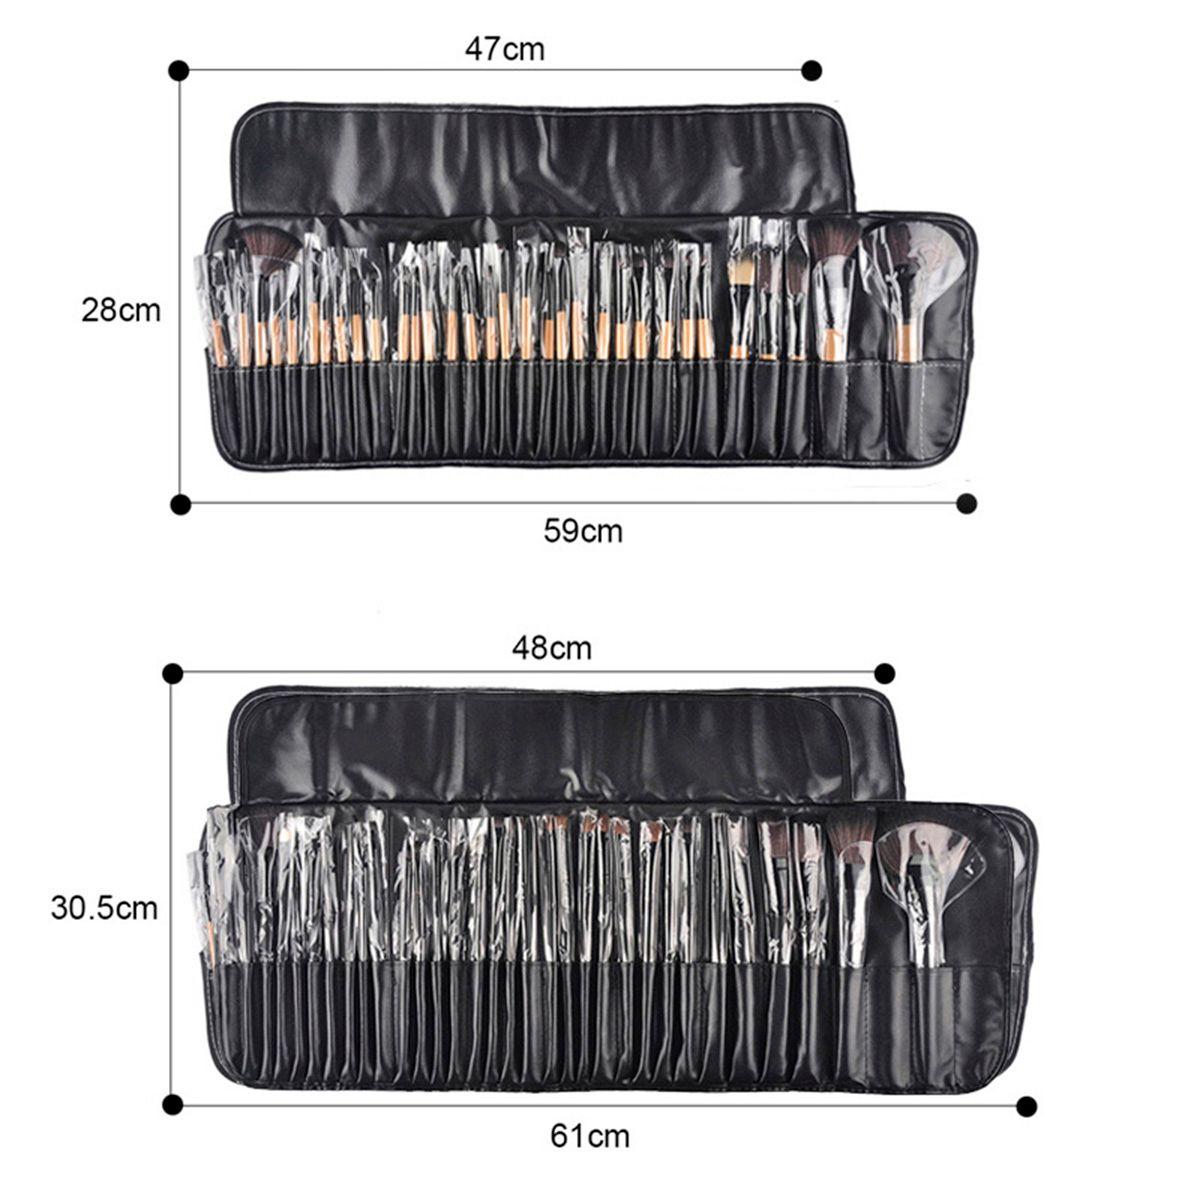 32 Stücke Professionelle Holz Make-Up Pinsel Kosmetik Make-Up Pinsel Set Roll Up Fall Eyeliner